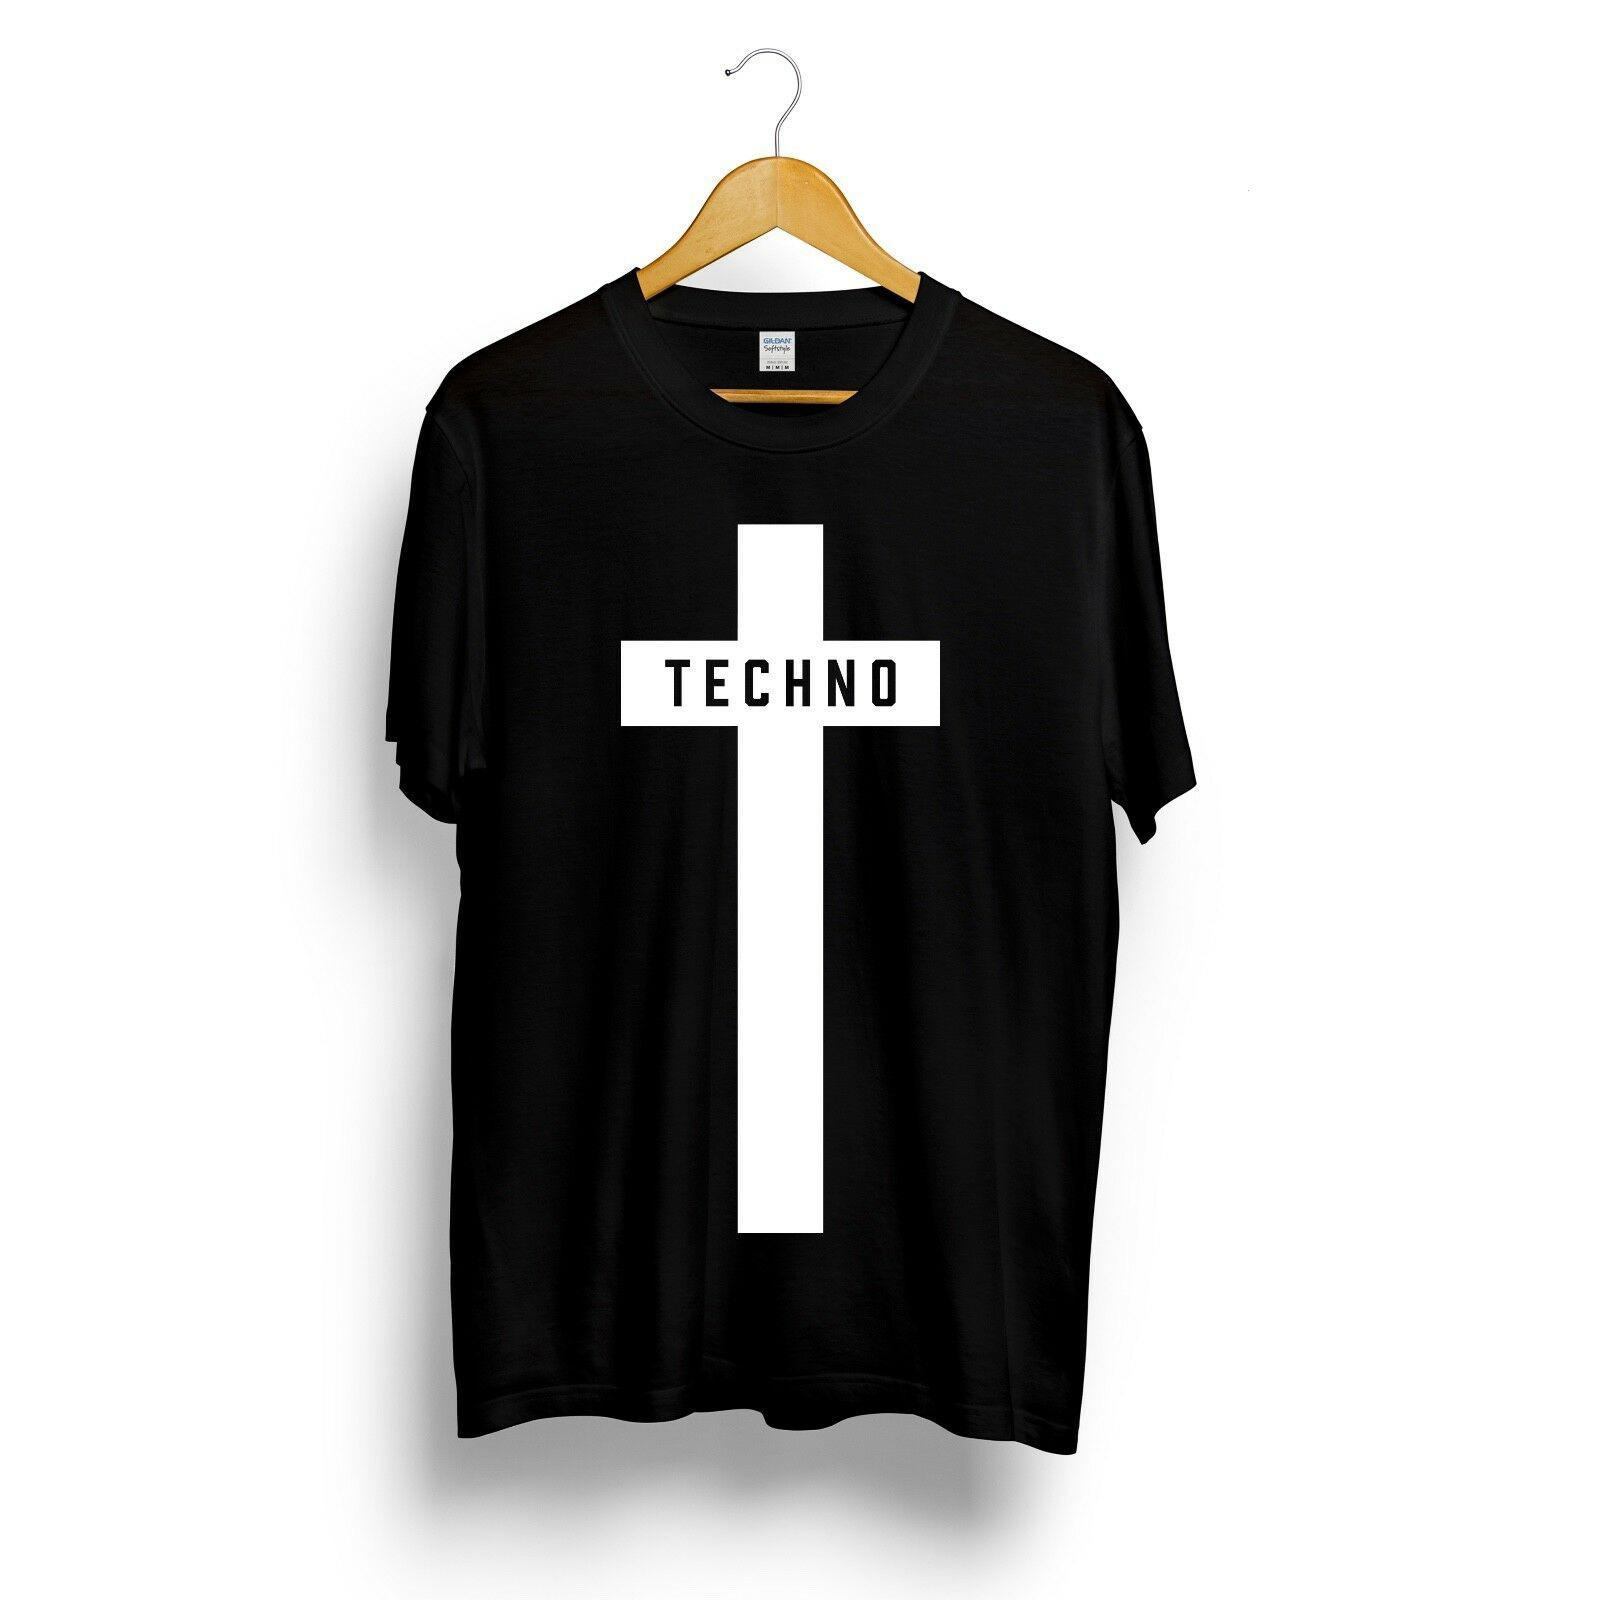 Techno Cross Printed Футболка мужская женщин мужской музыкальный фестиваль Black Detroit Tee Top Summer Streetwear Camiseta Masculina